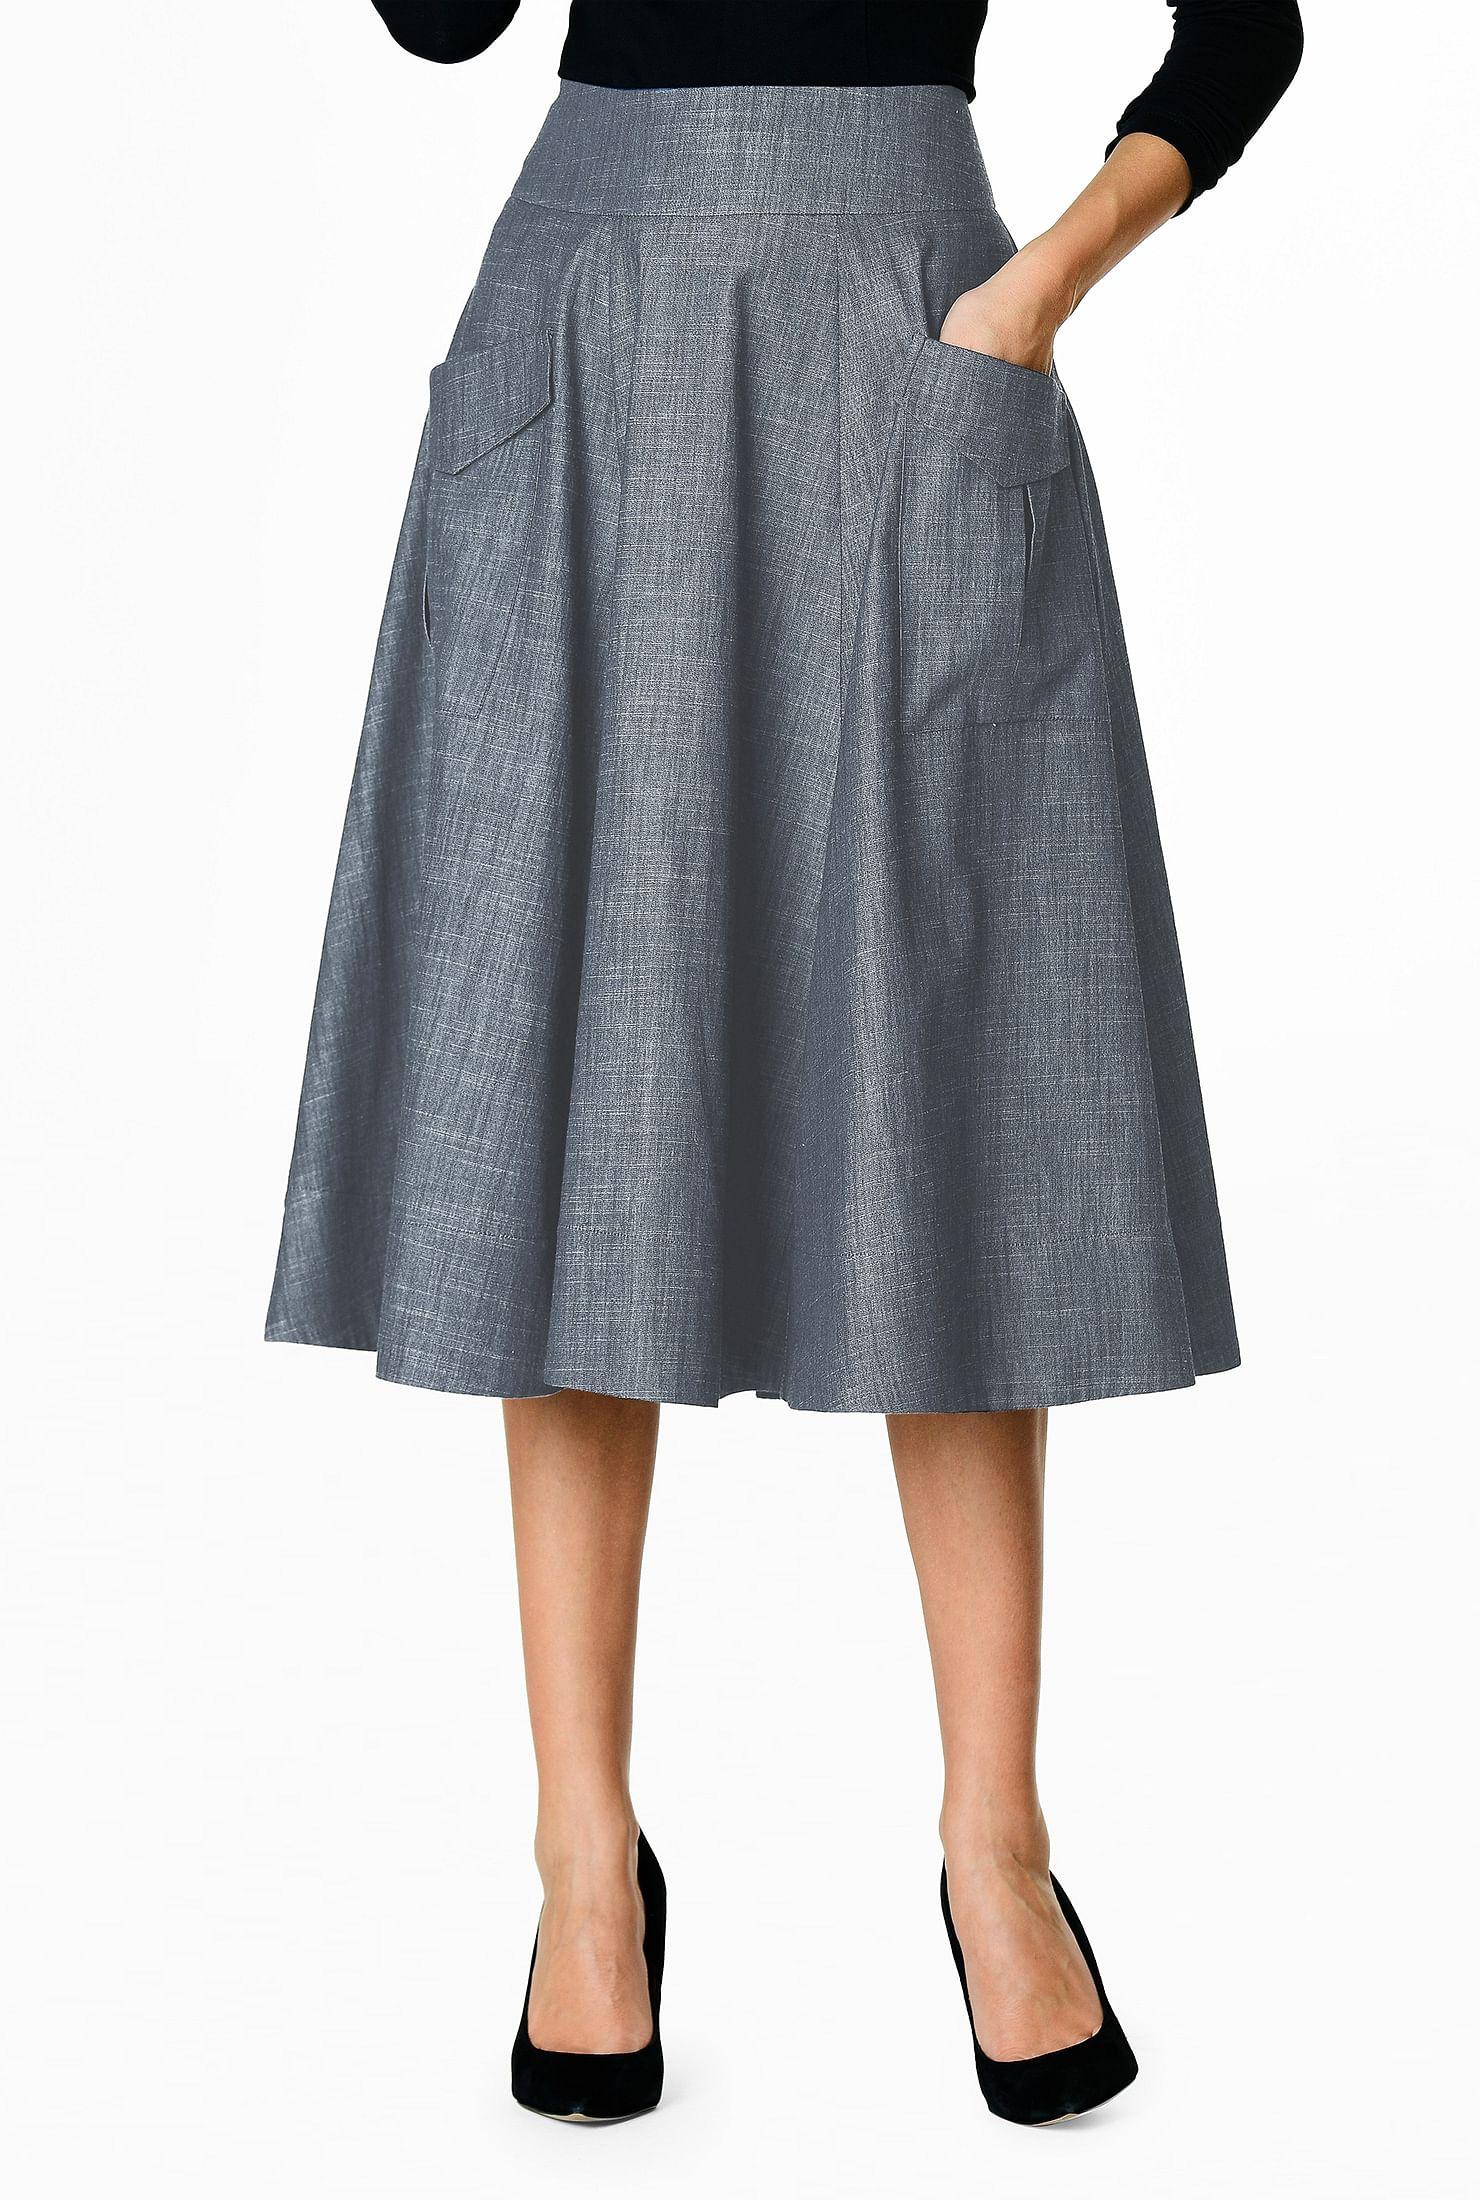 6b127c4729 banded waist skirts, cotton skirts, Feminine Skirts, full flare skirts,  indigo